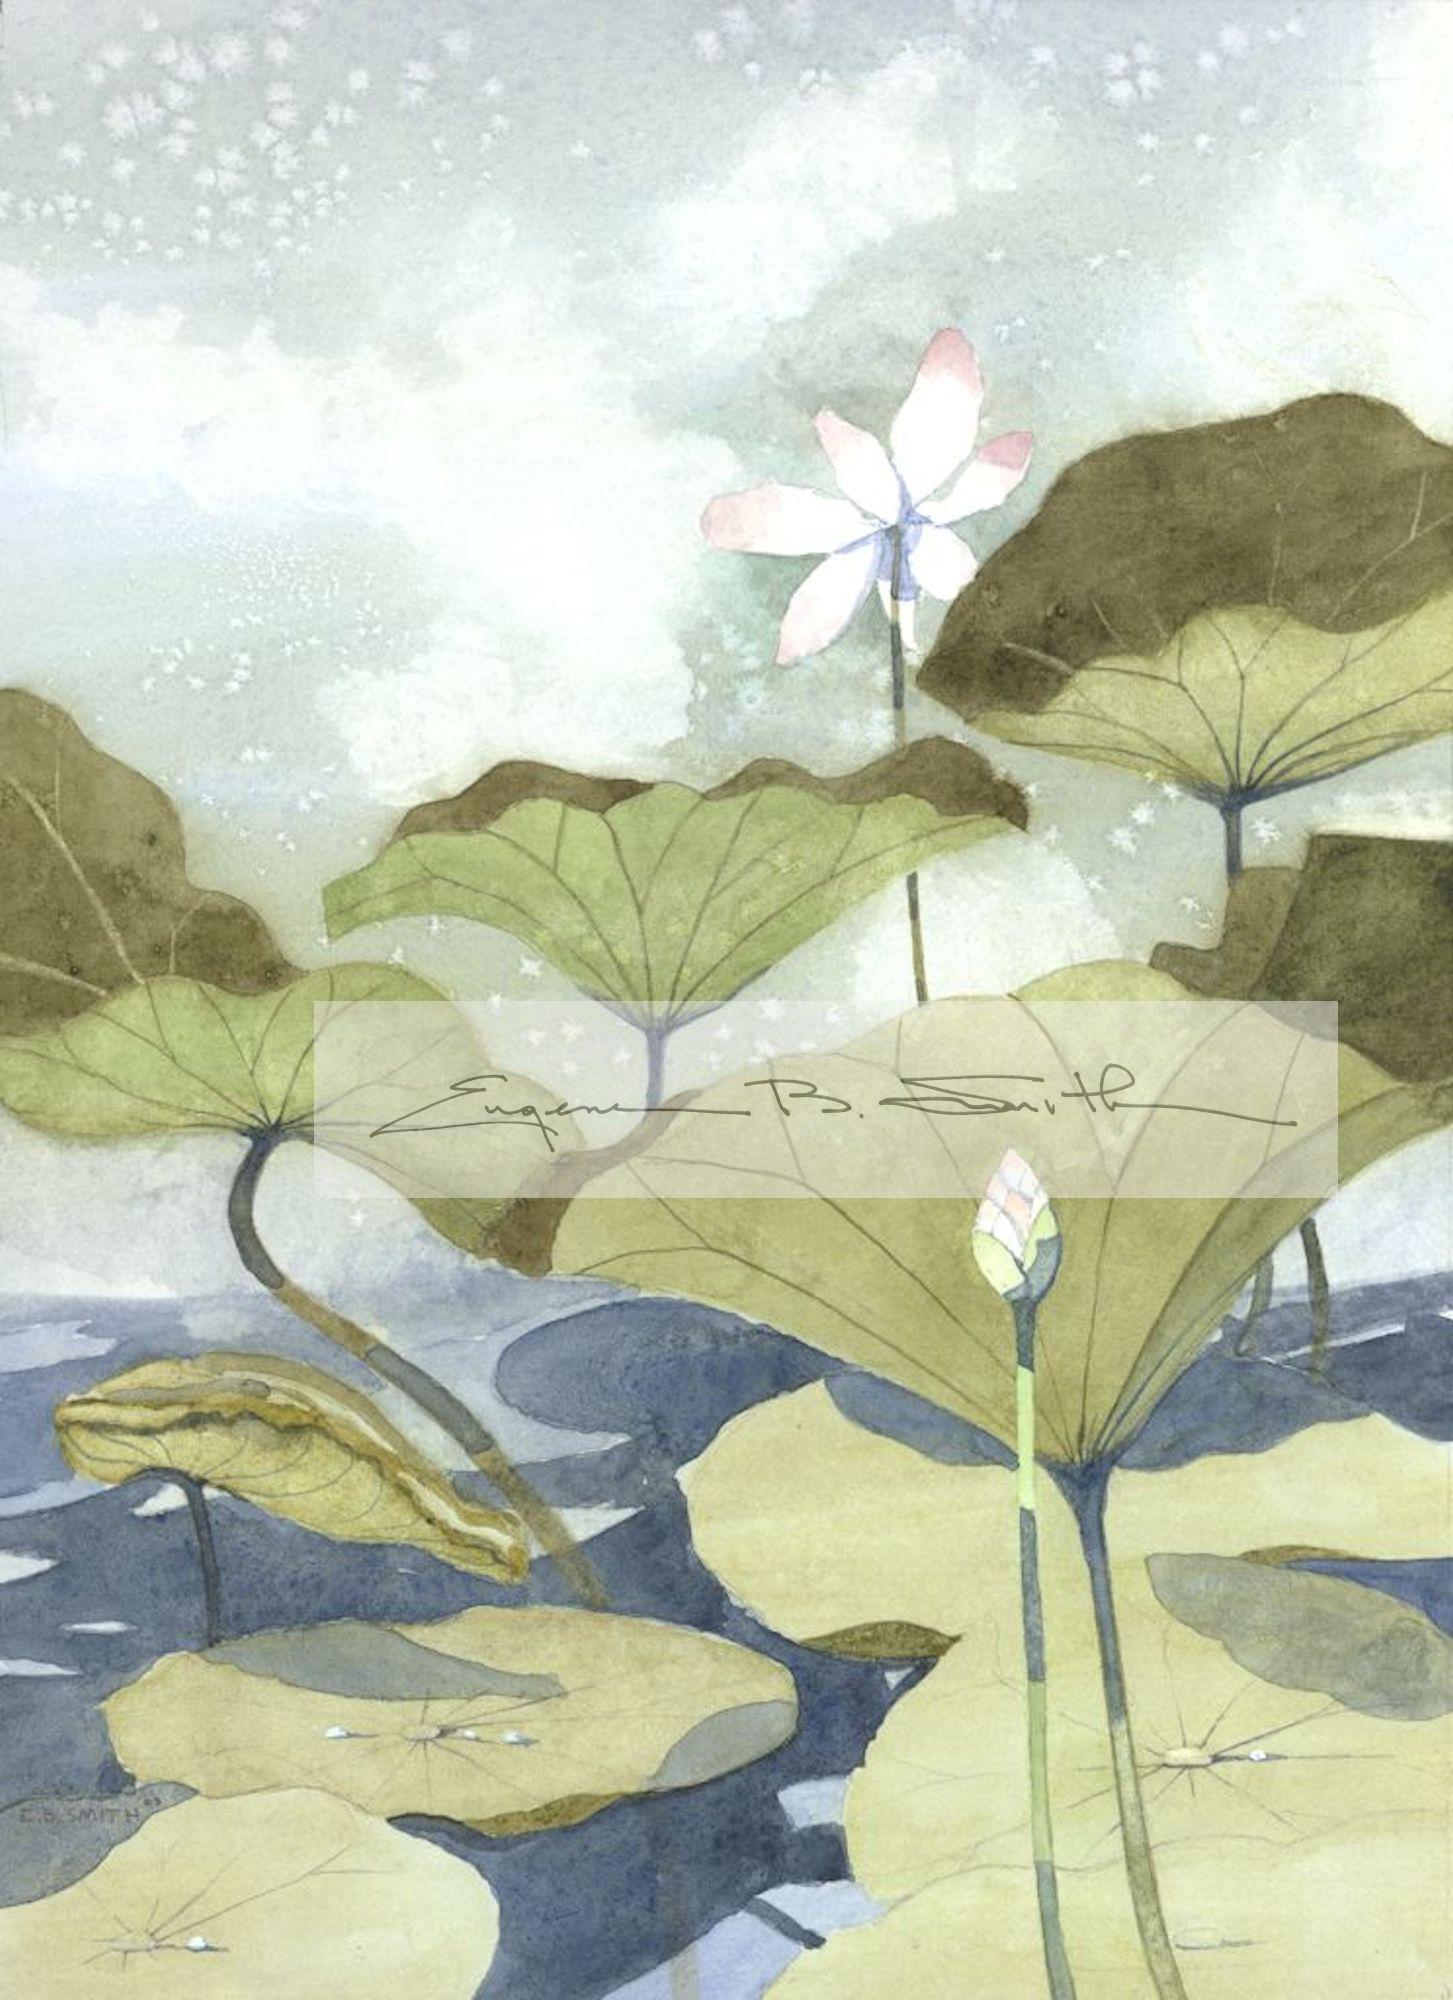 Giclee Print | Image Size: 14.5 x 10.5 | $135 | Frame Size: 24 x 20